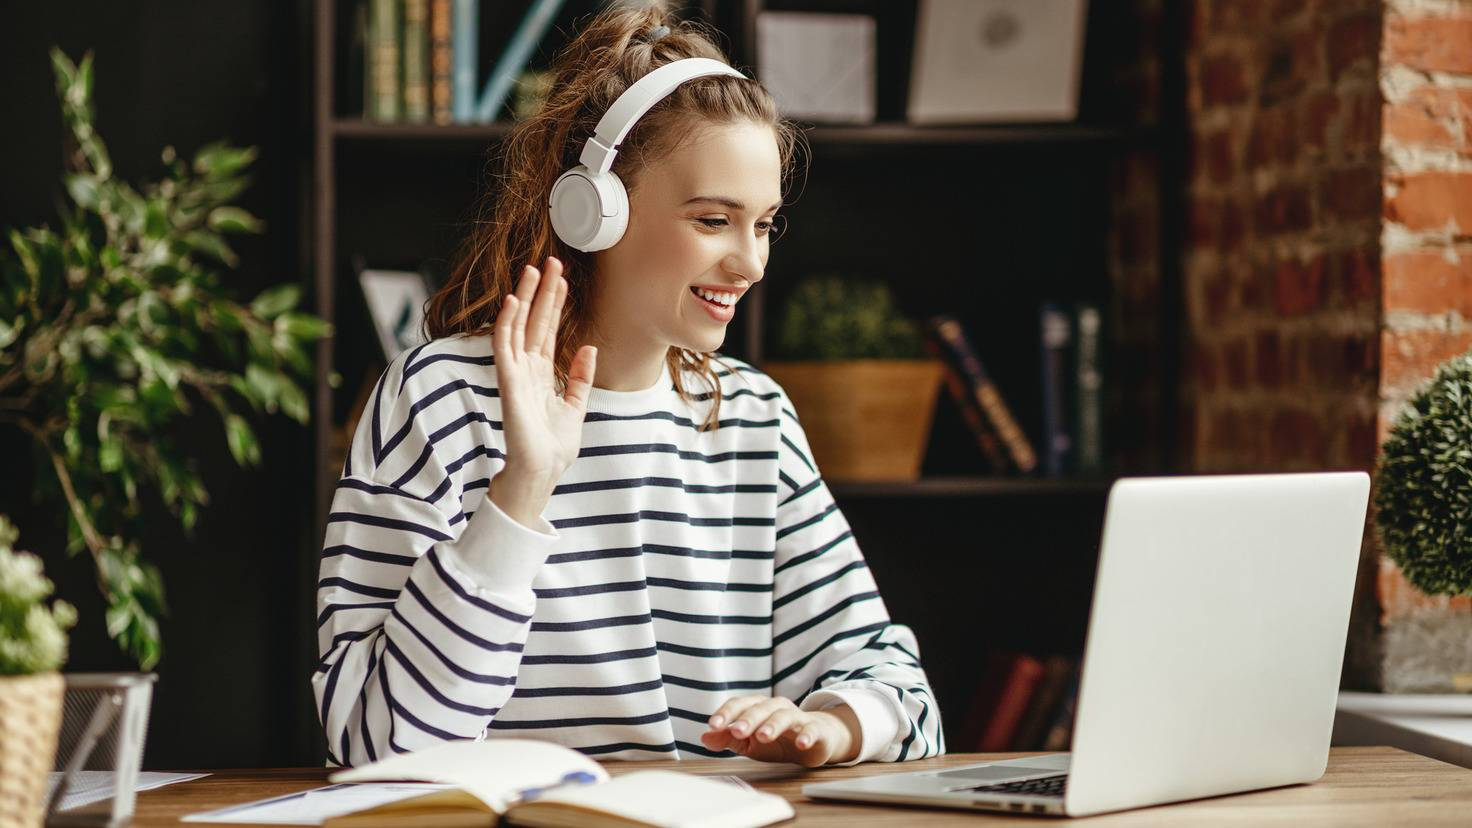 Studentin-Laptop-Notebook-Studenten-Lernen